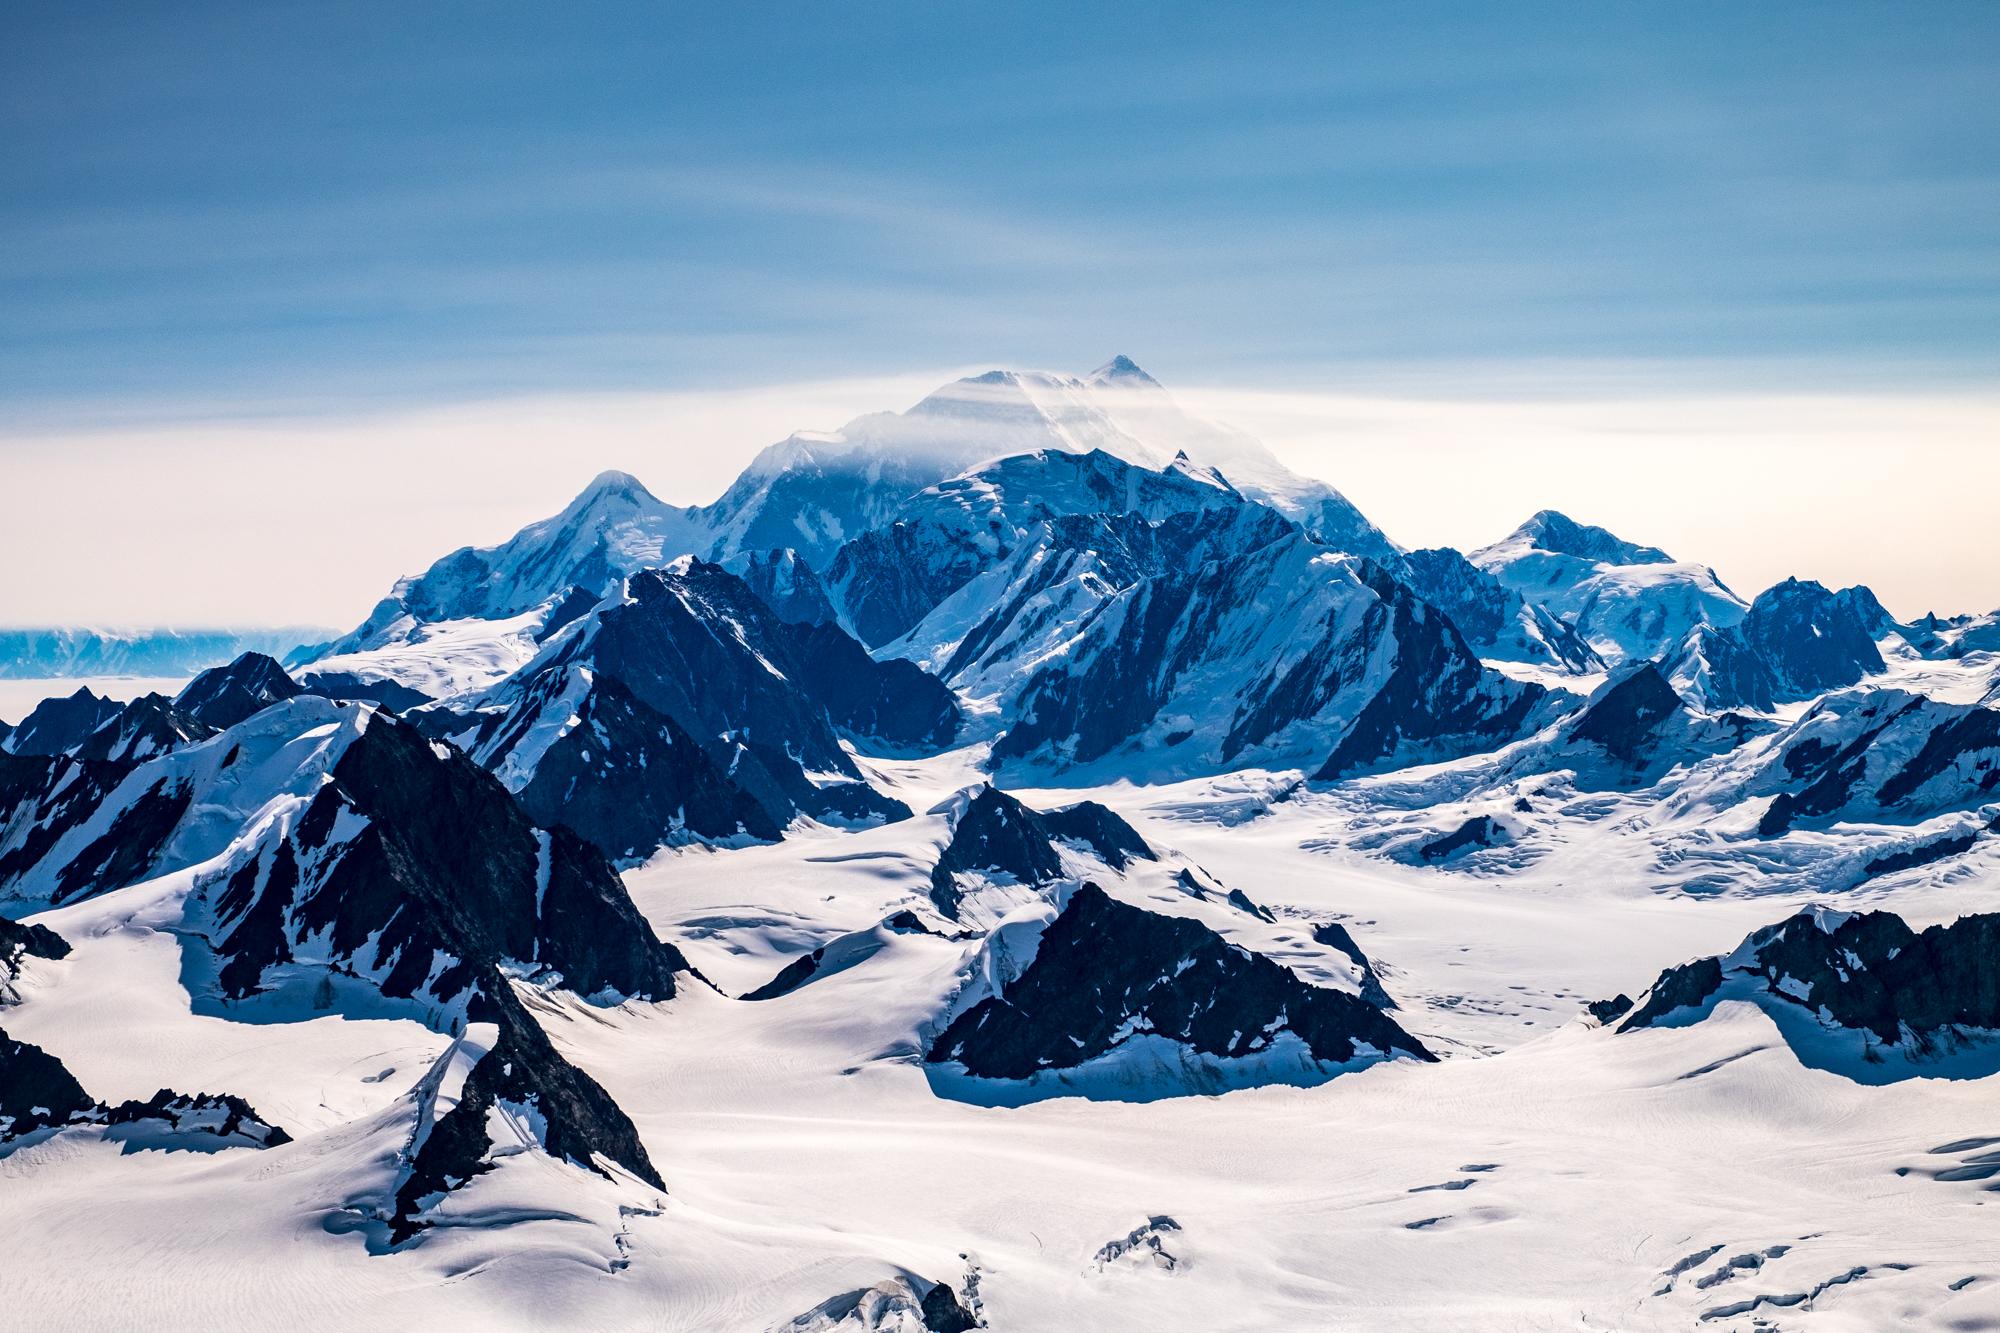 Mount St. Elias  — the second highest peak in North America behind Denali.